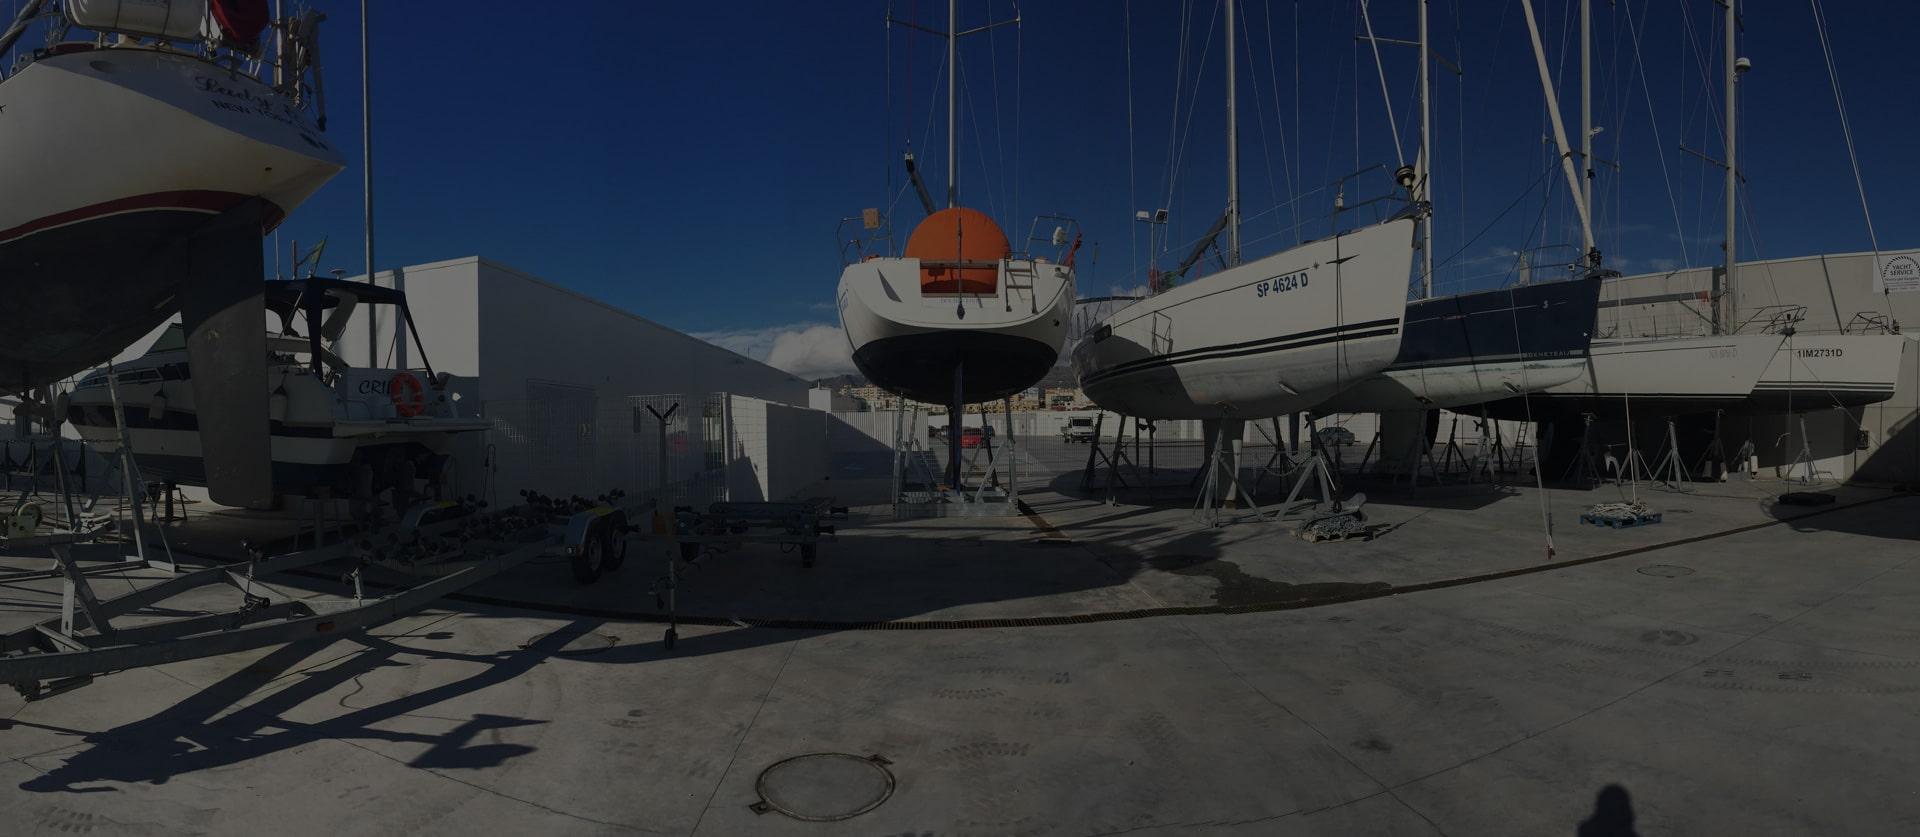 Panoramica prodotti Naval Tecno Sud